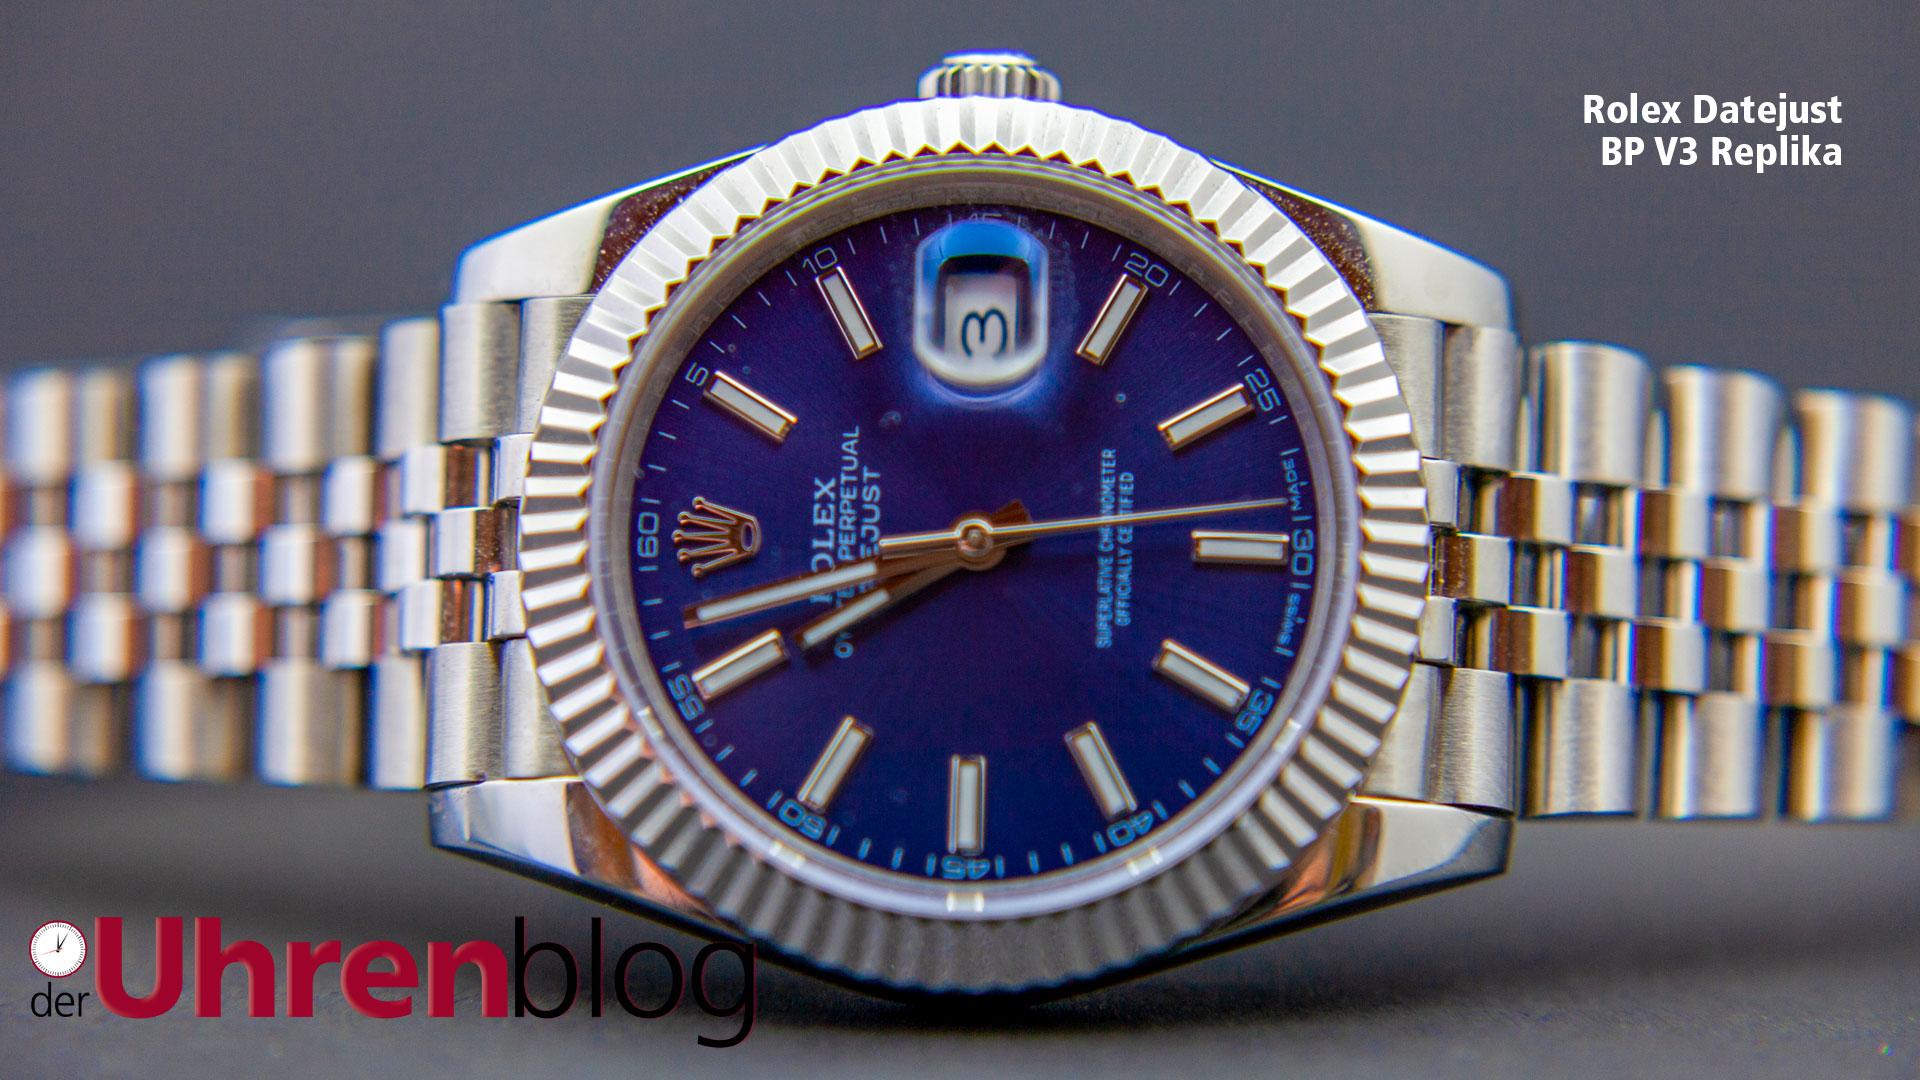 BP Factory V3 Rolex Datejust